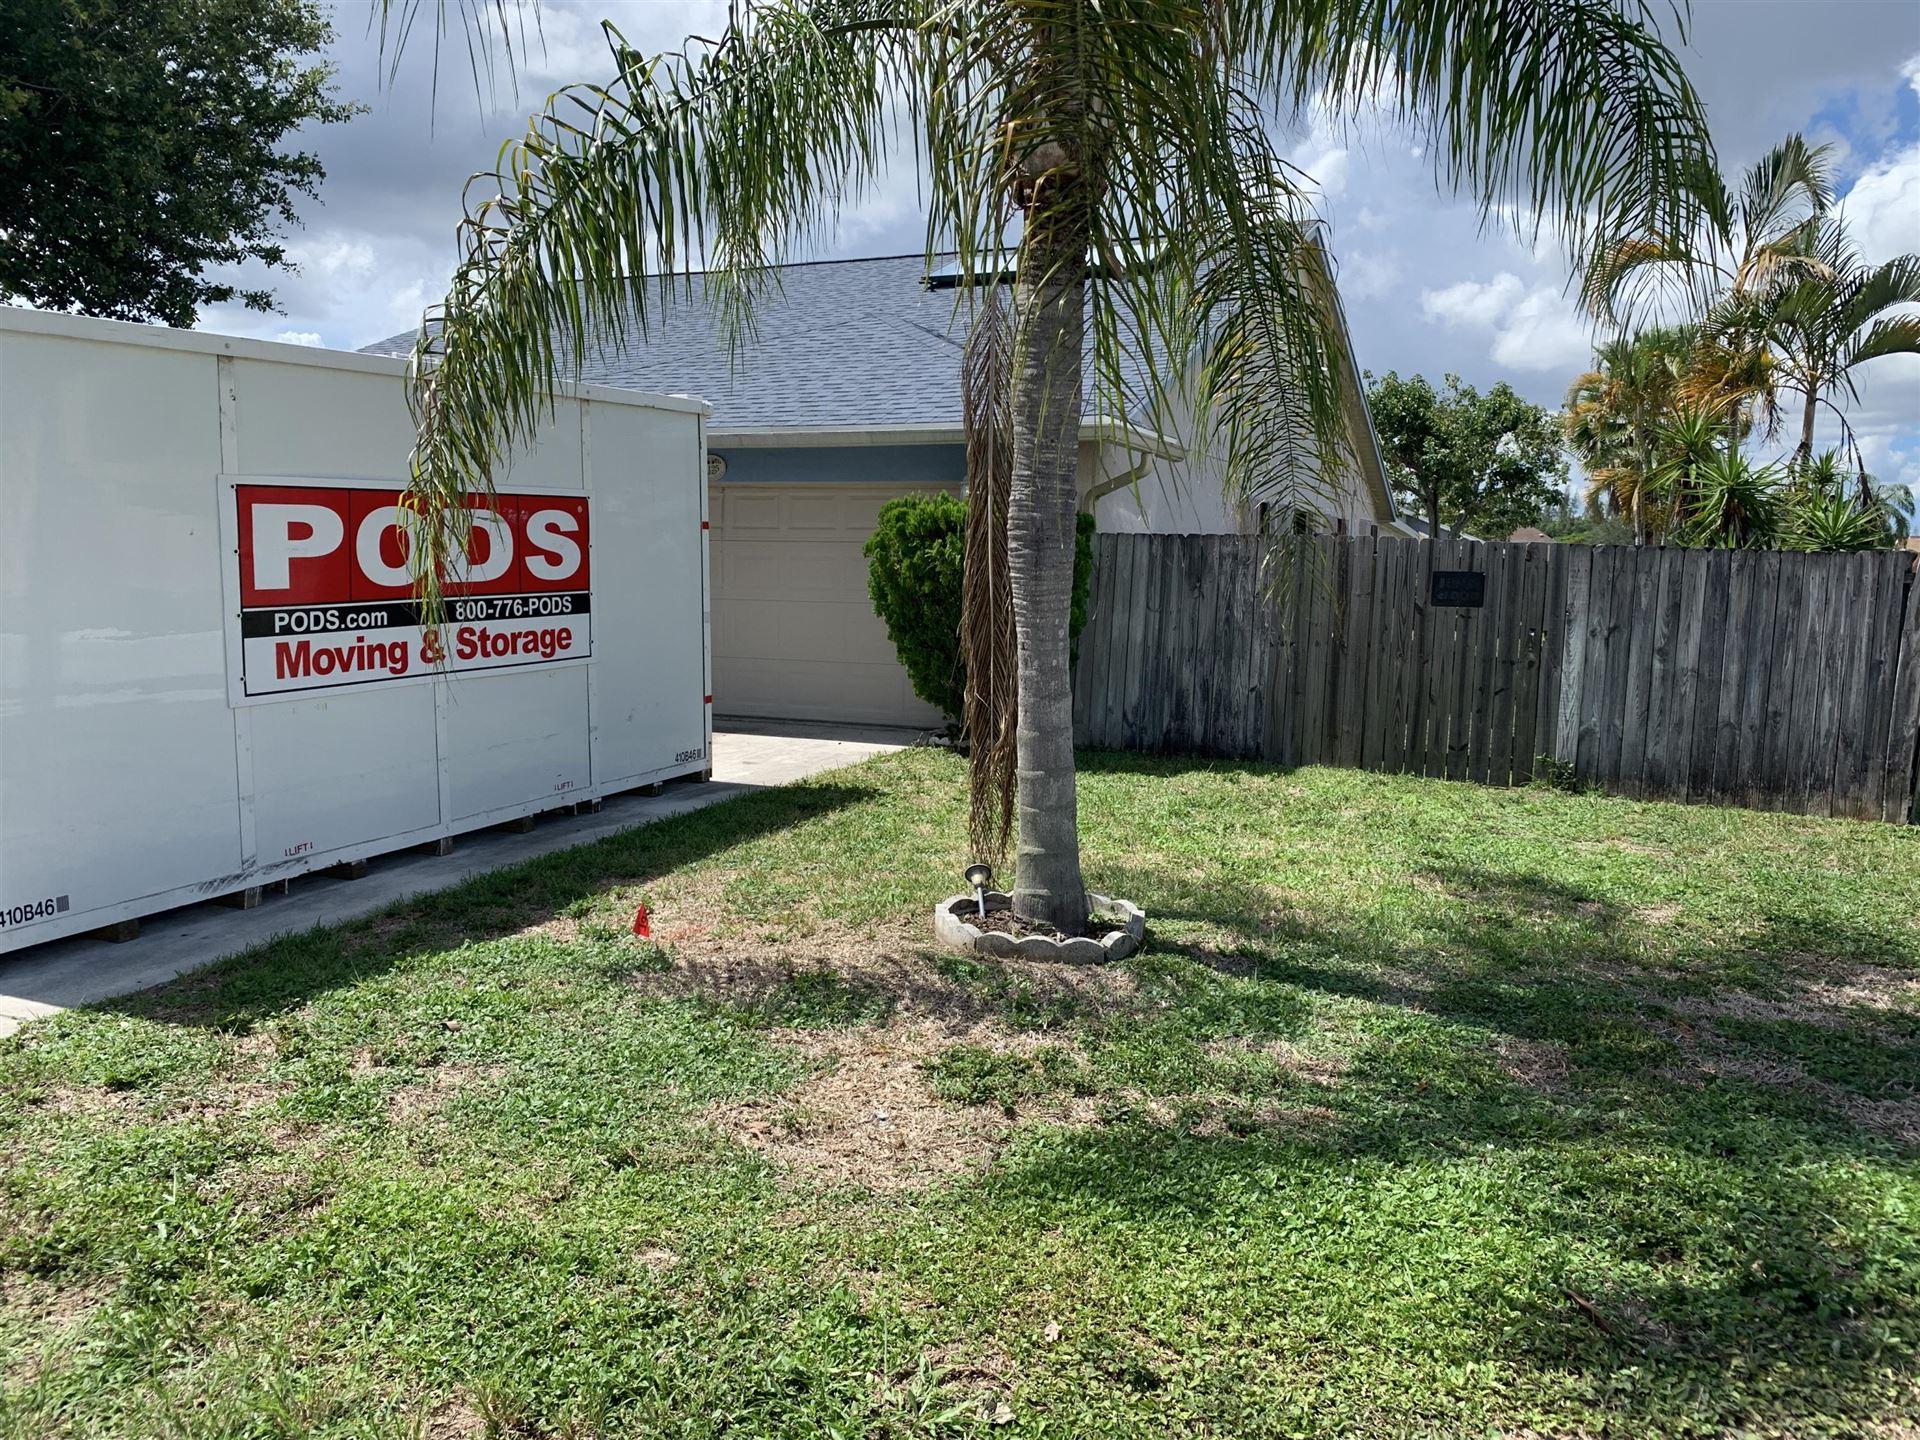 5125 Foxhall Drive N, West Palm Beach, FL 33417 - MLS#: RX-10728486